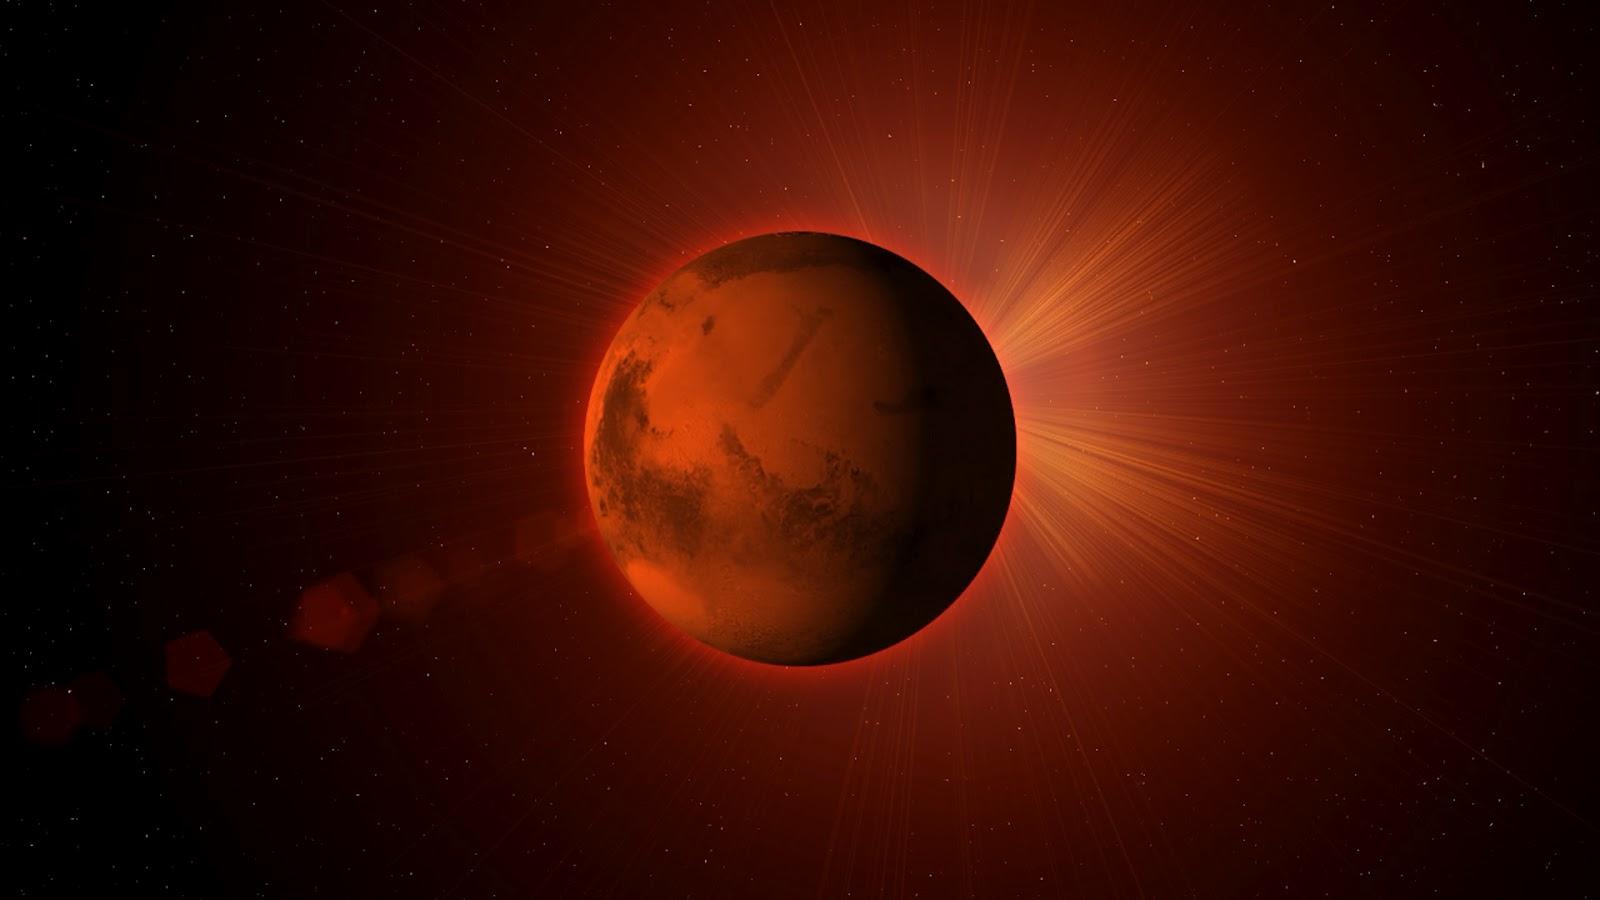 http://2.bp.blogspot.com/-TC0NVxlQmLk/UCY1HkLR3ZI/AAAAAAAAMWE/8Ab0yQFurLc/s1600/mars-planet-wincustomize-explore-561293.jpg